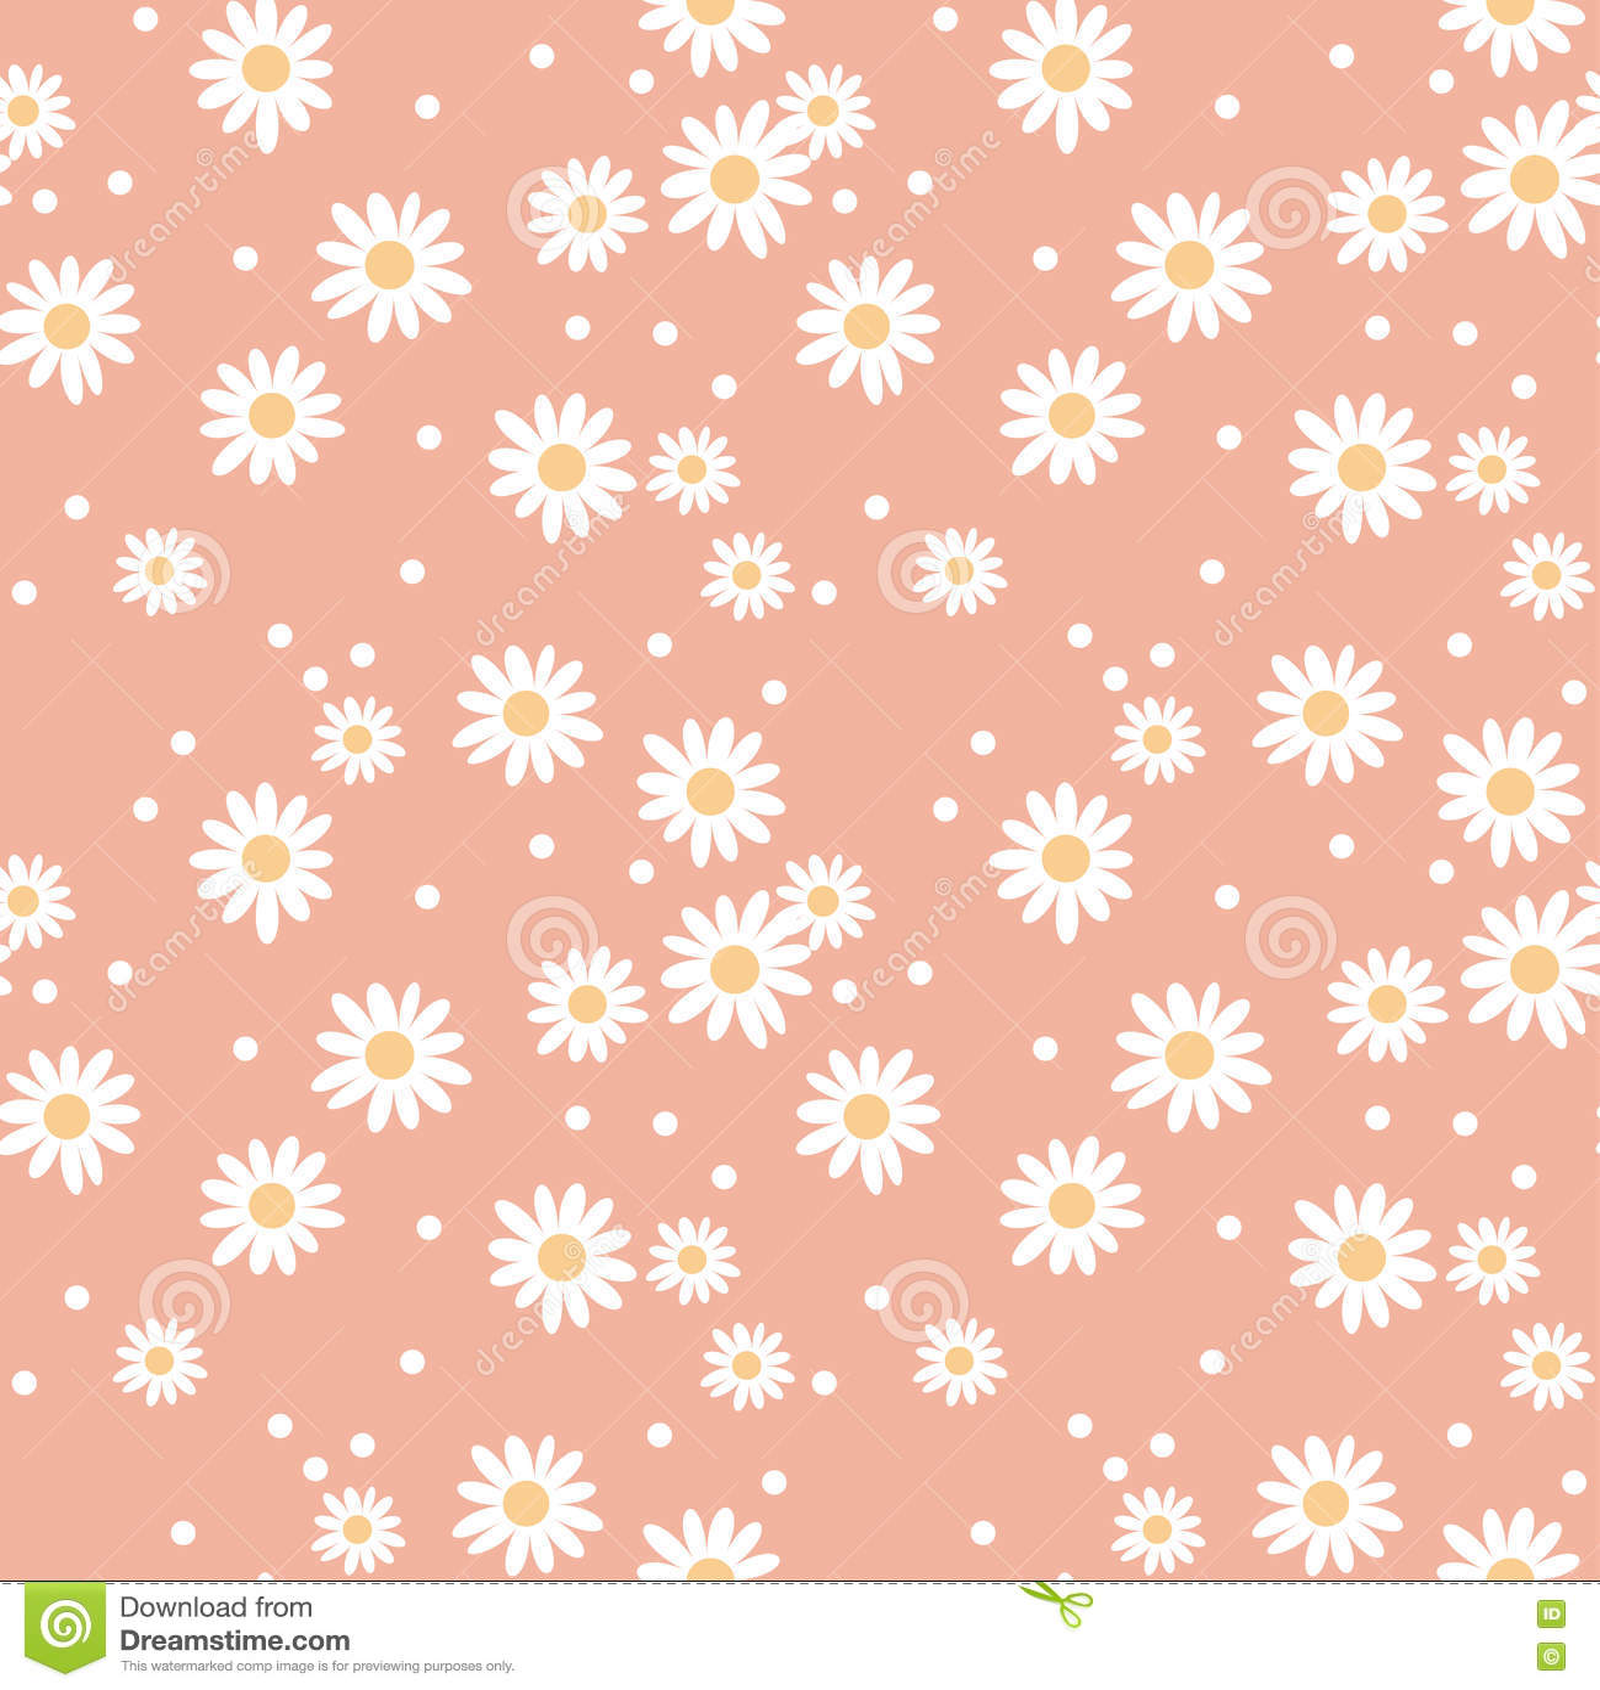 Daisy Cute Seamless Pattern. Stock Vector